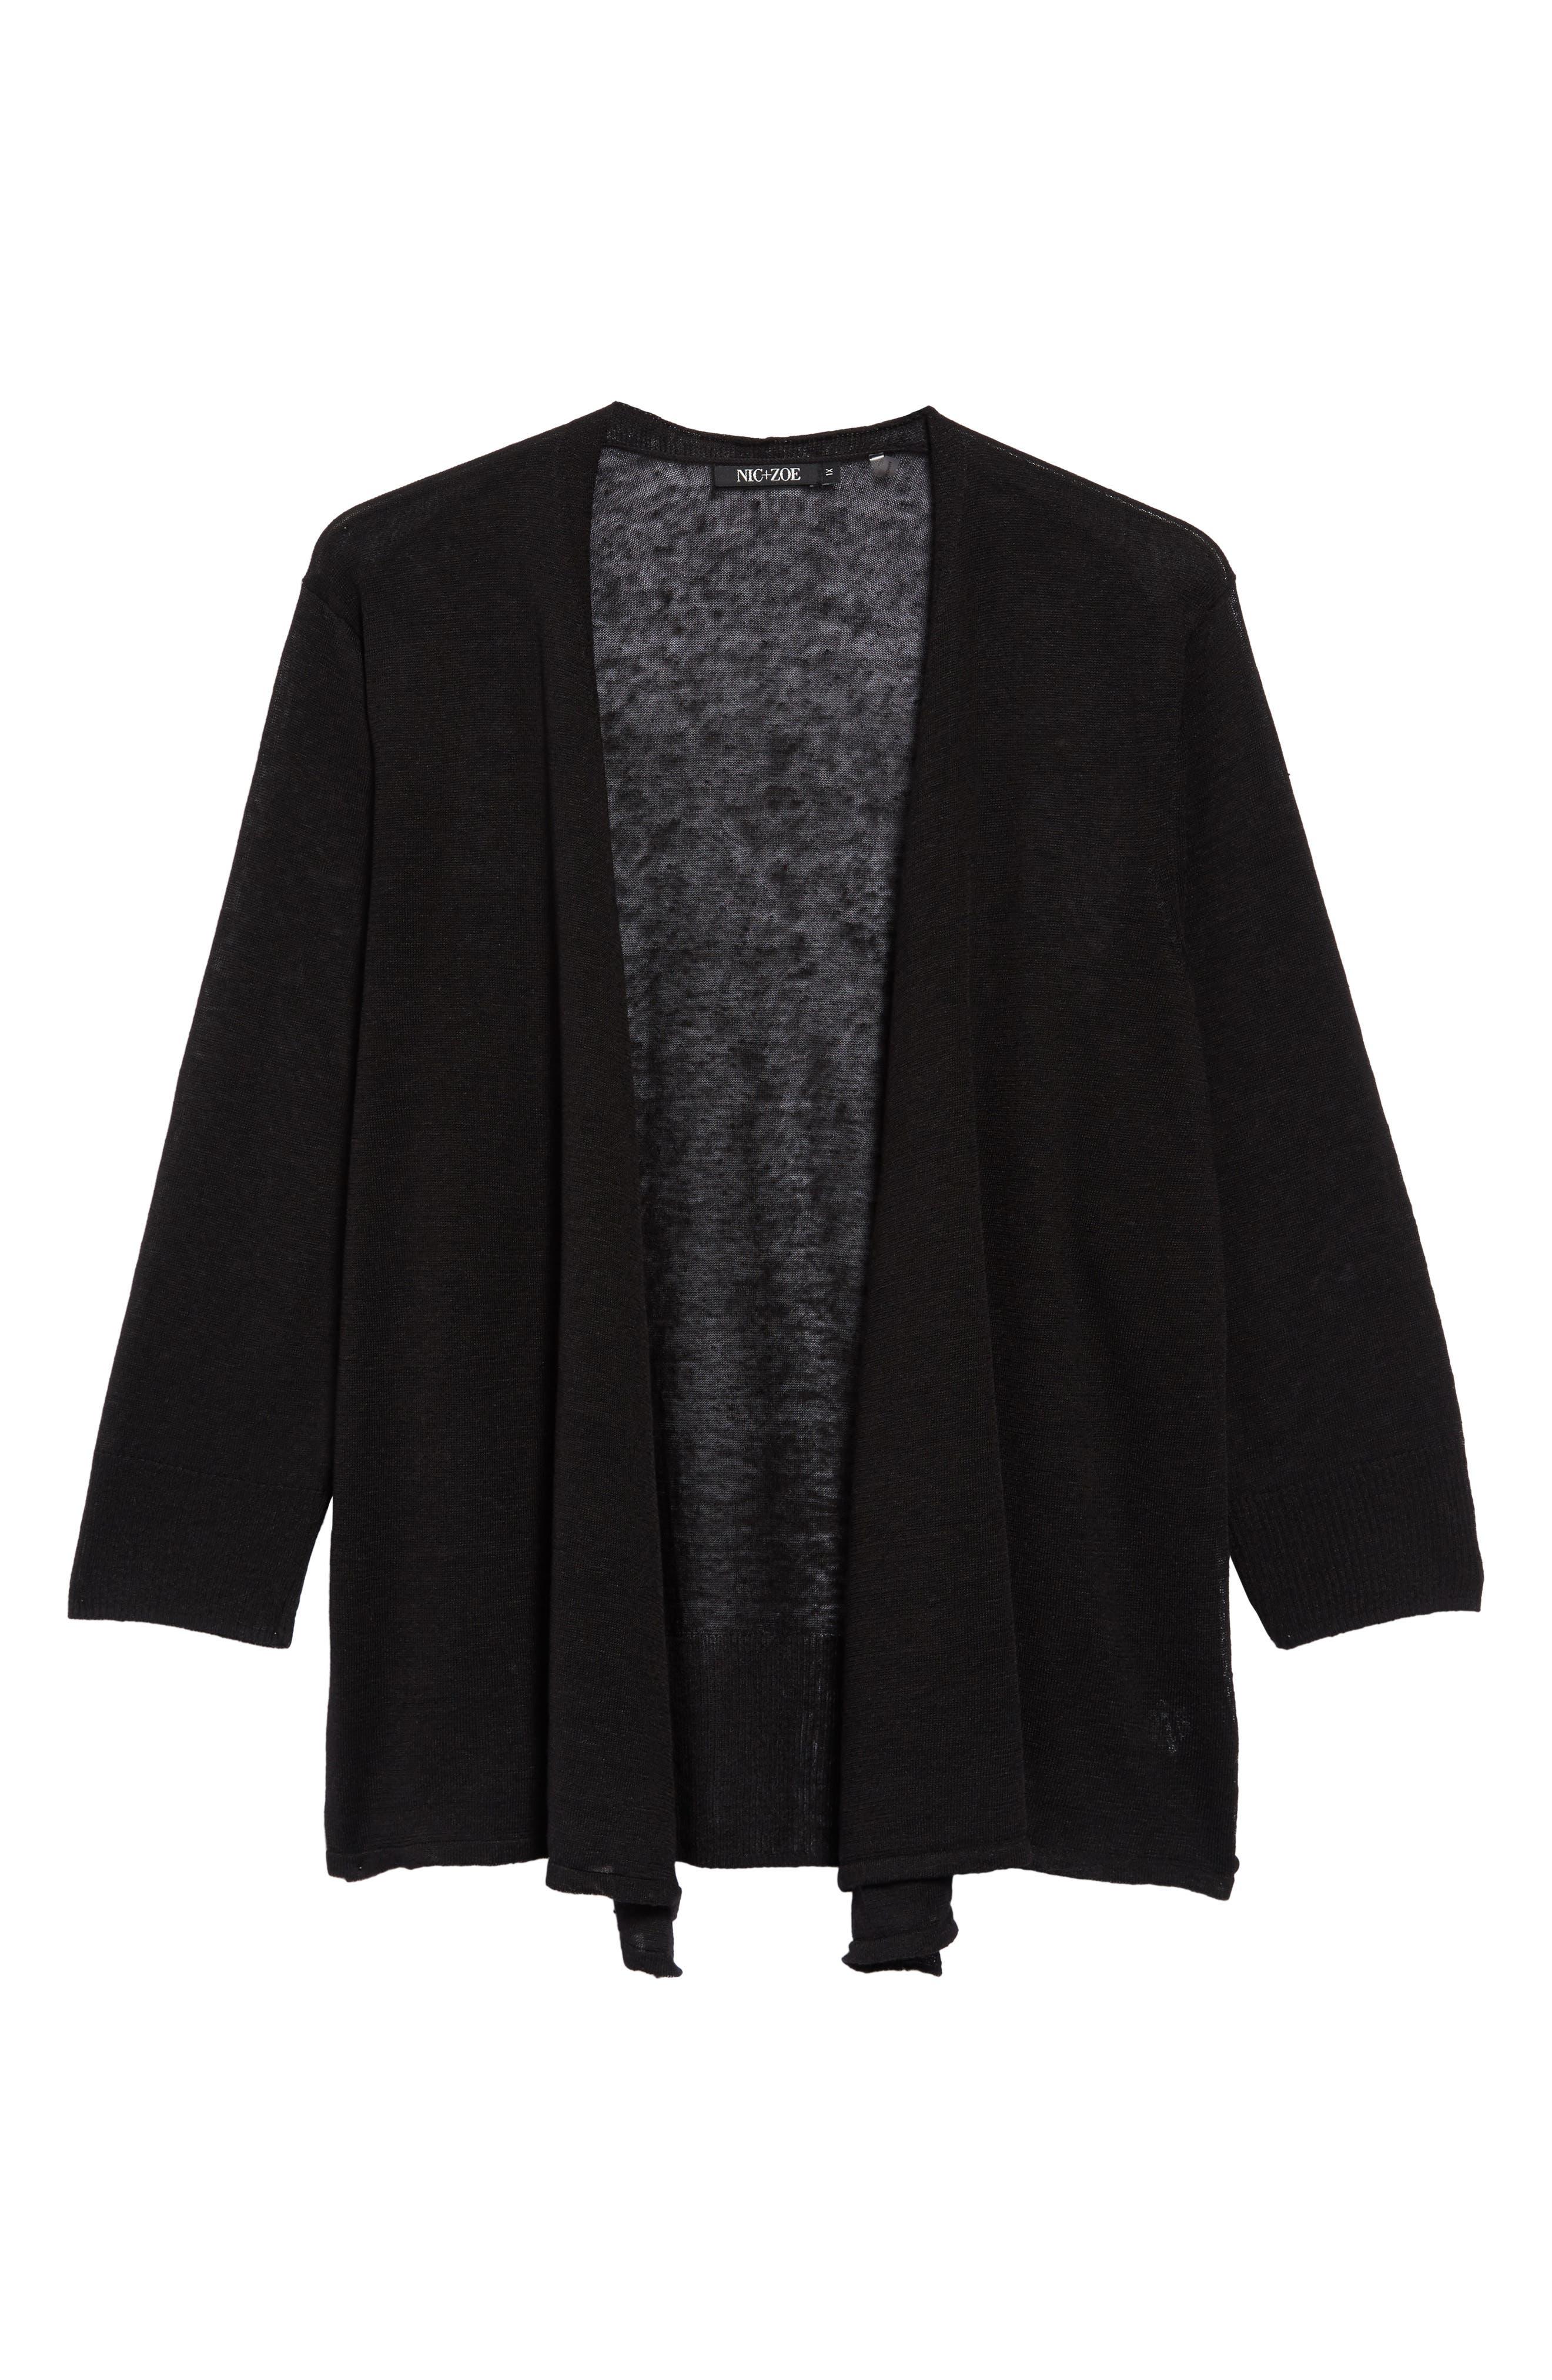 '4-Way' Three Quarter Sleeve Convertible Cardigan,                             Main thumbnail 1, color,                             BLACK ONYX